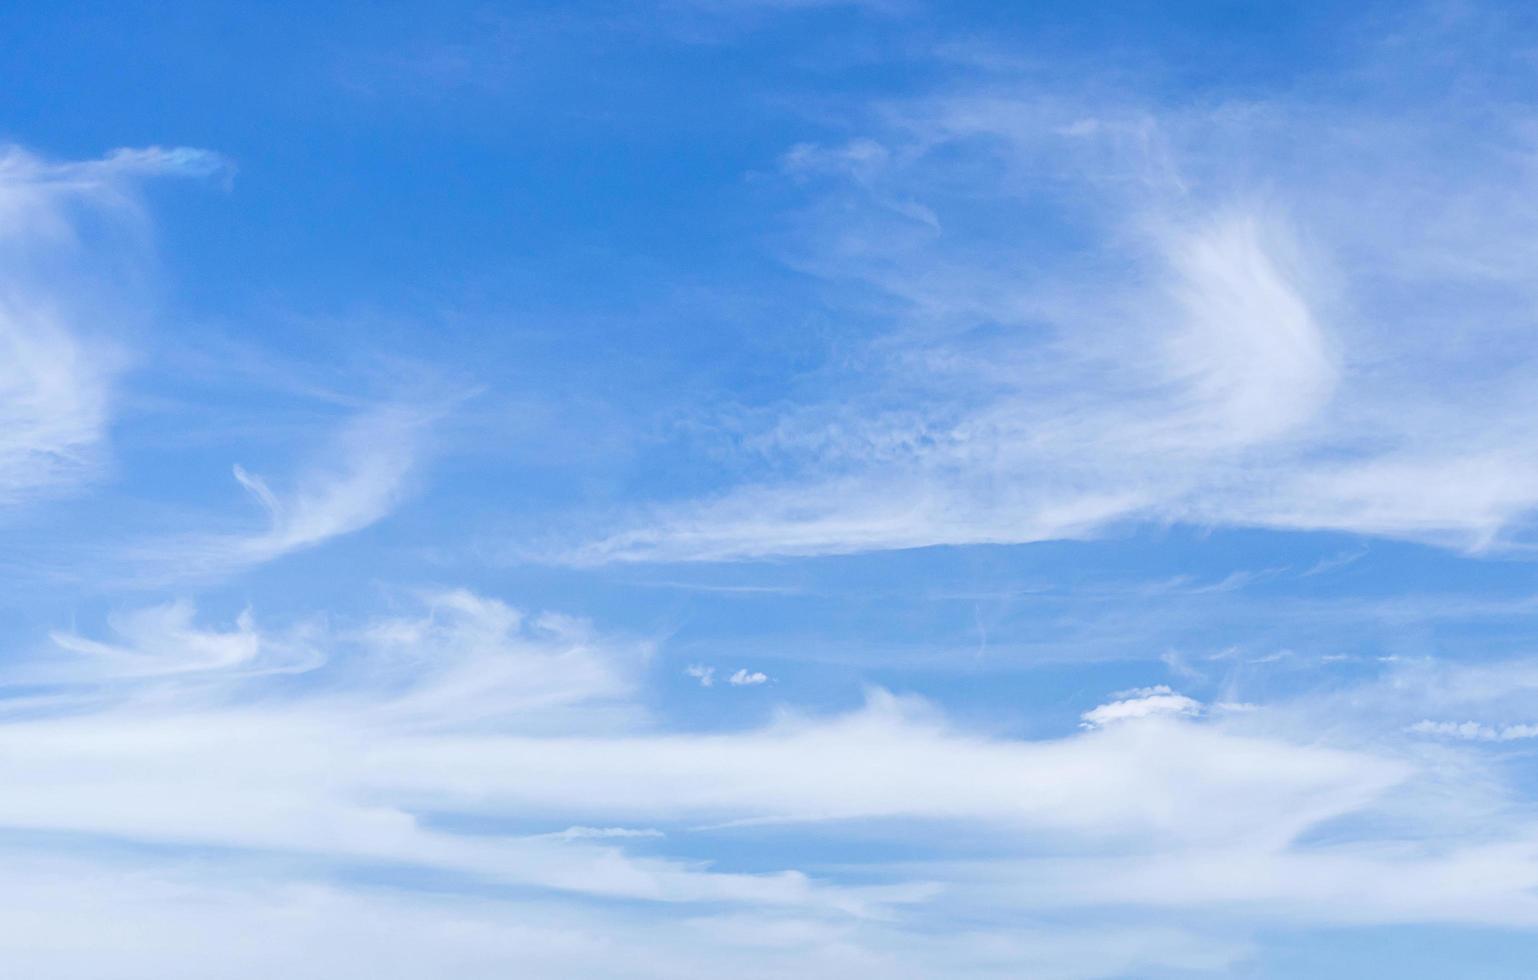 Blue cloudy sky photo